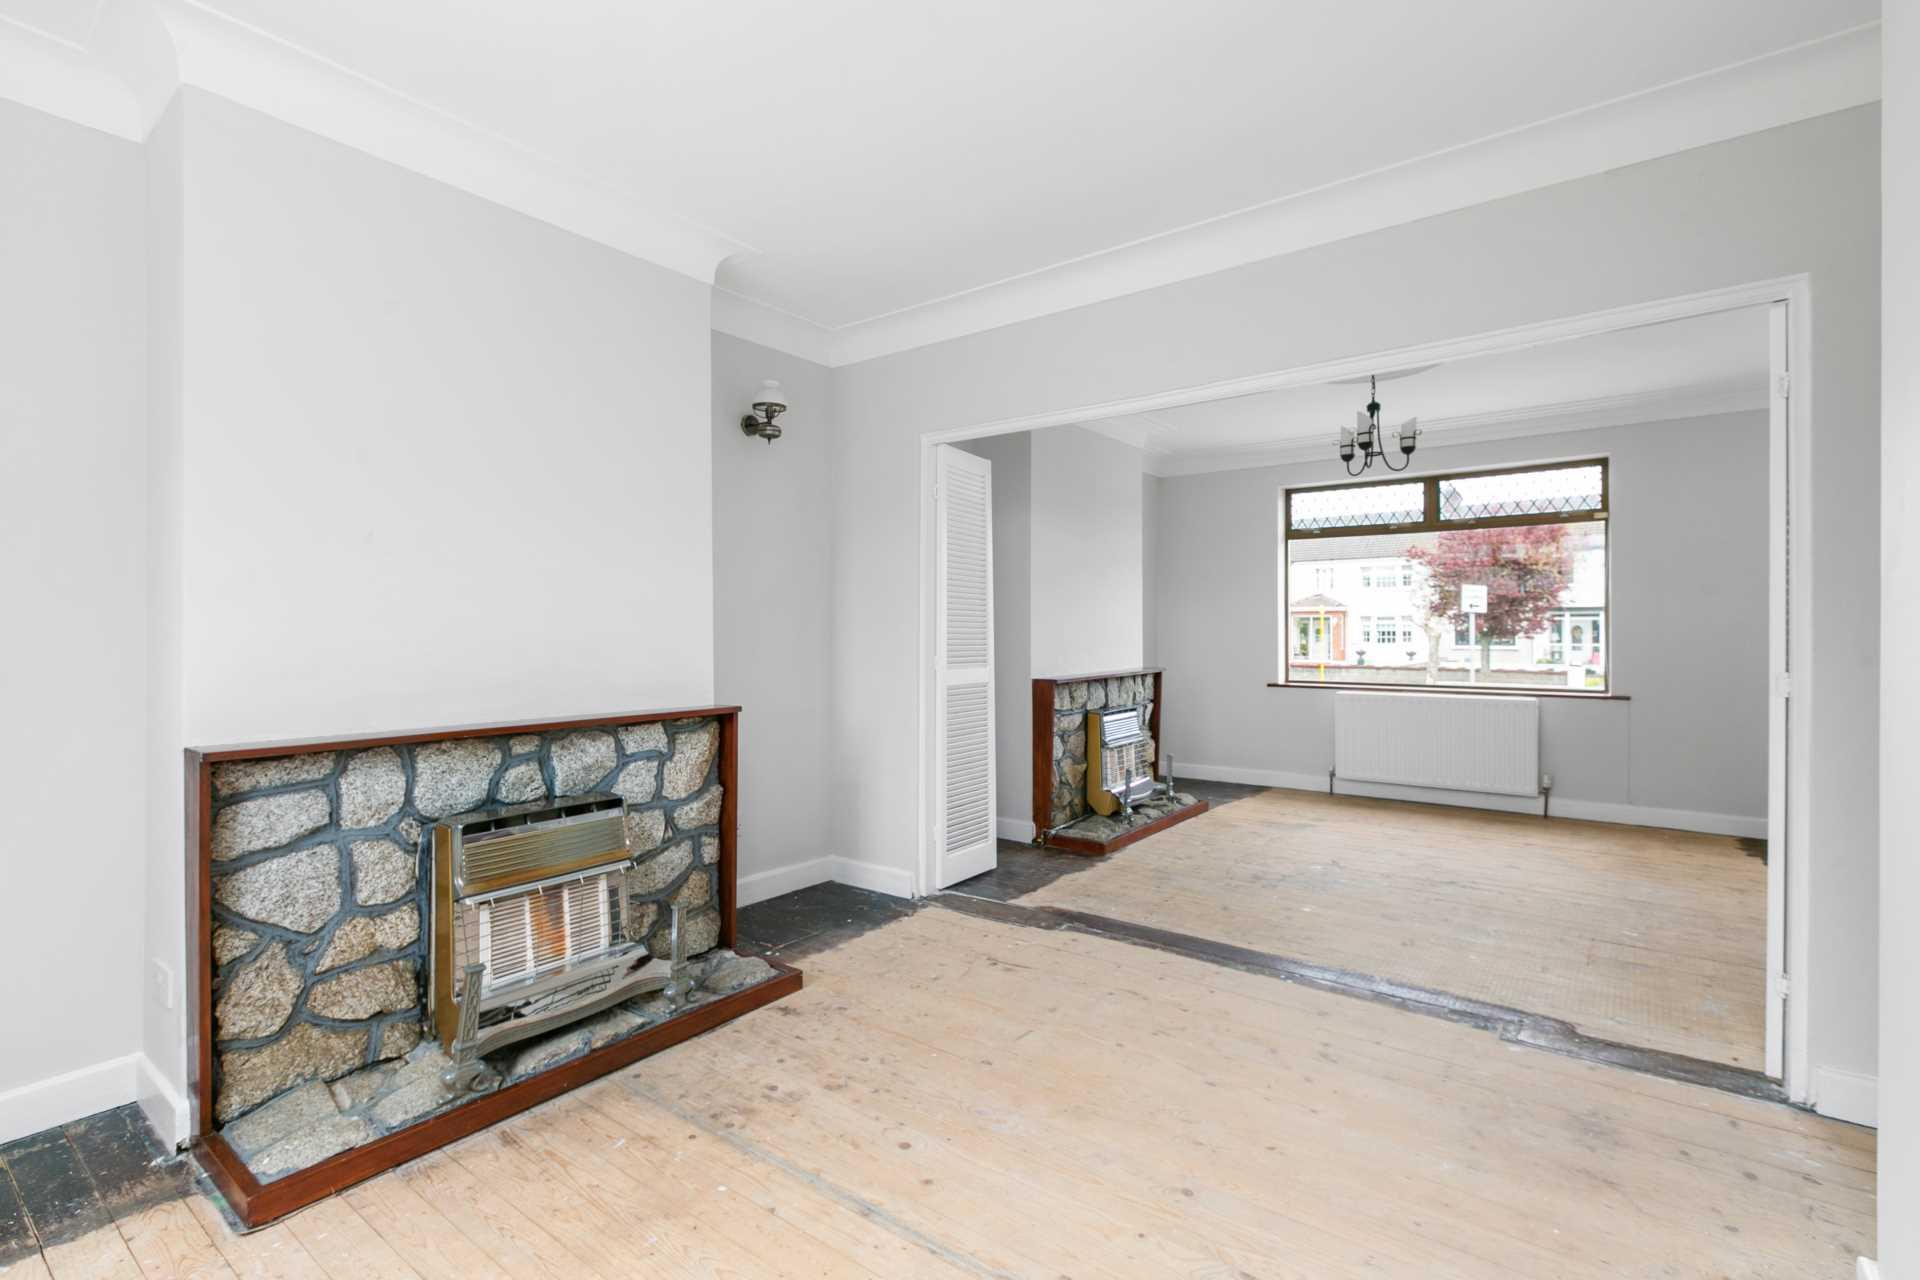 157 Whitehall Road West, Manor Estate, Terenure, Dublin 12, Image 2